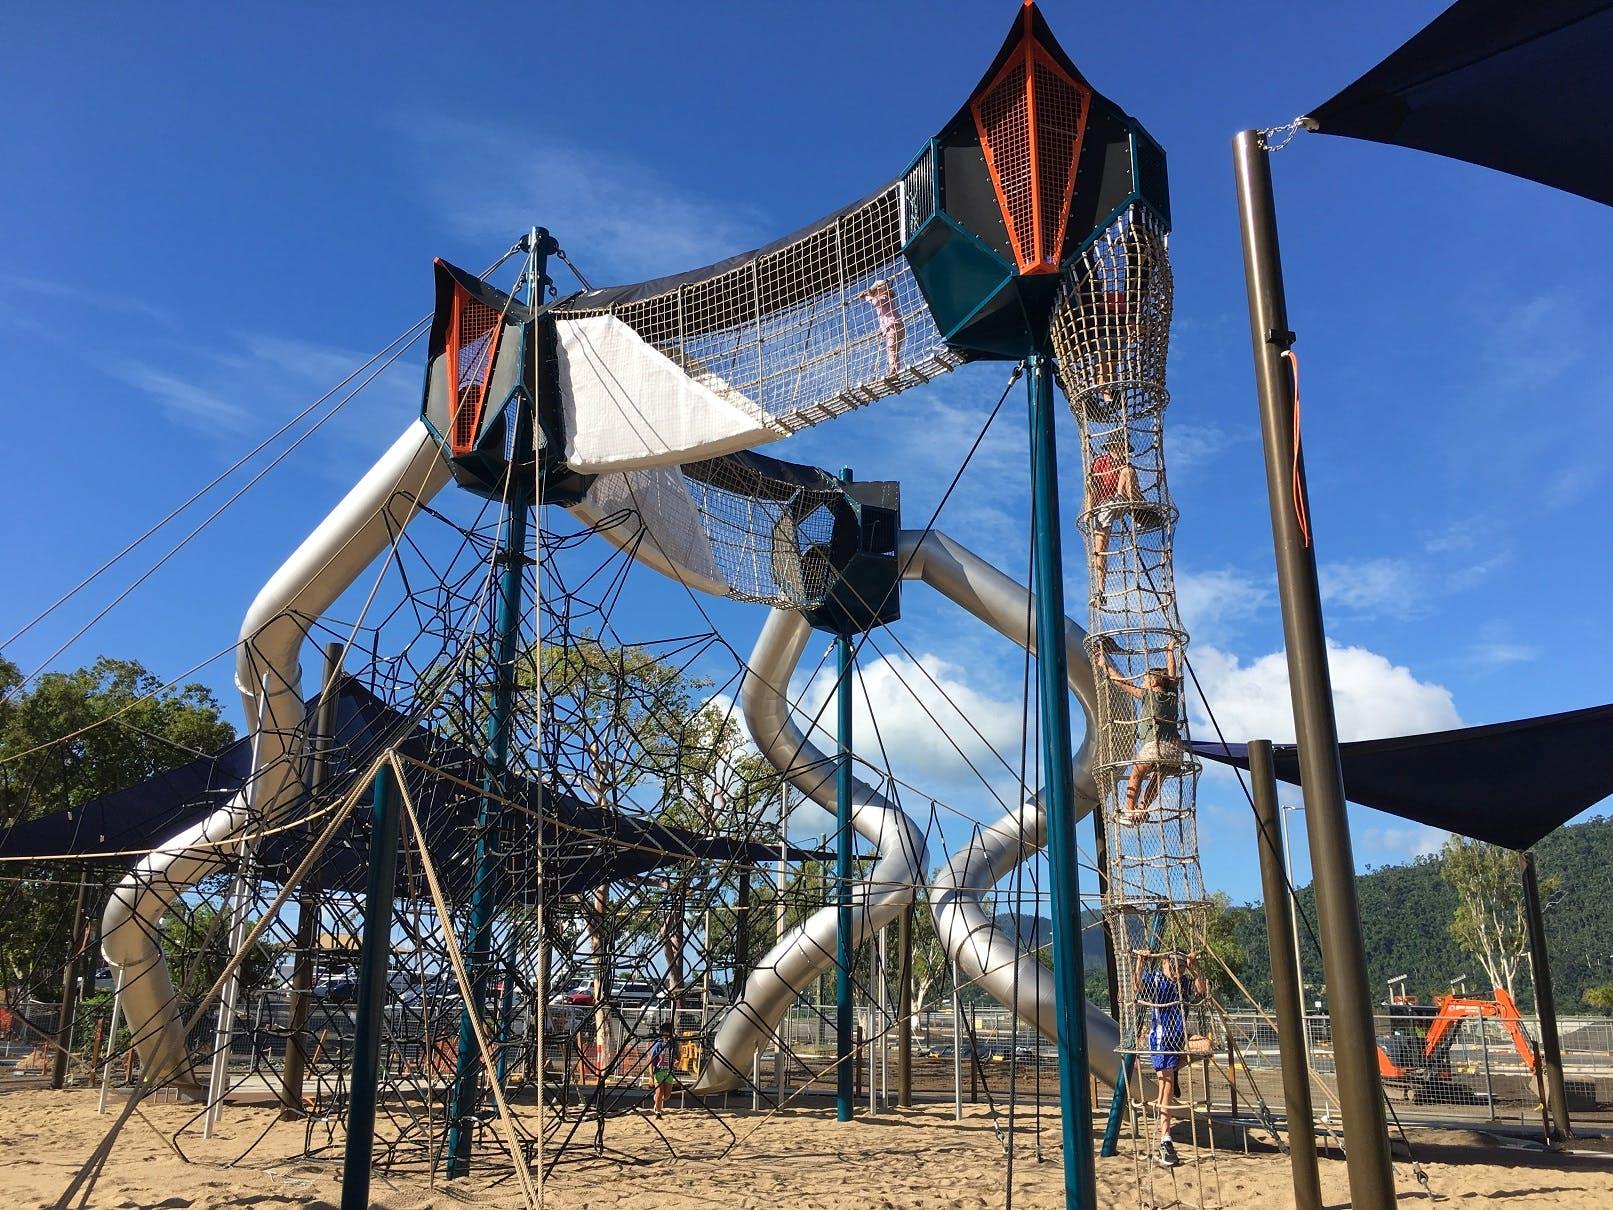 New Playground - opened 19 April